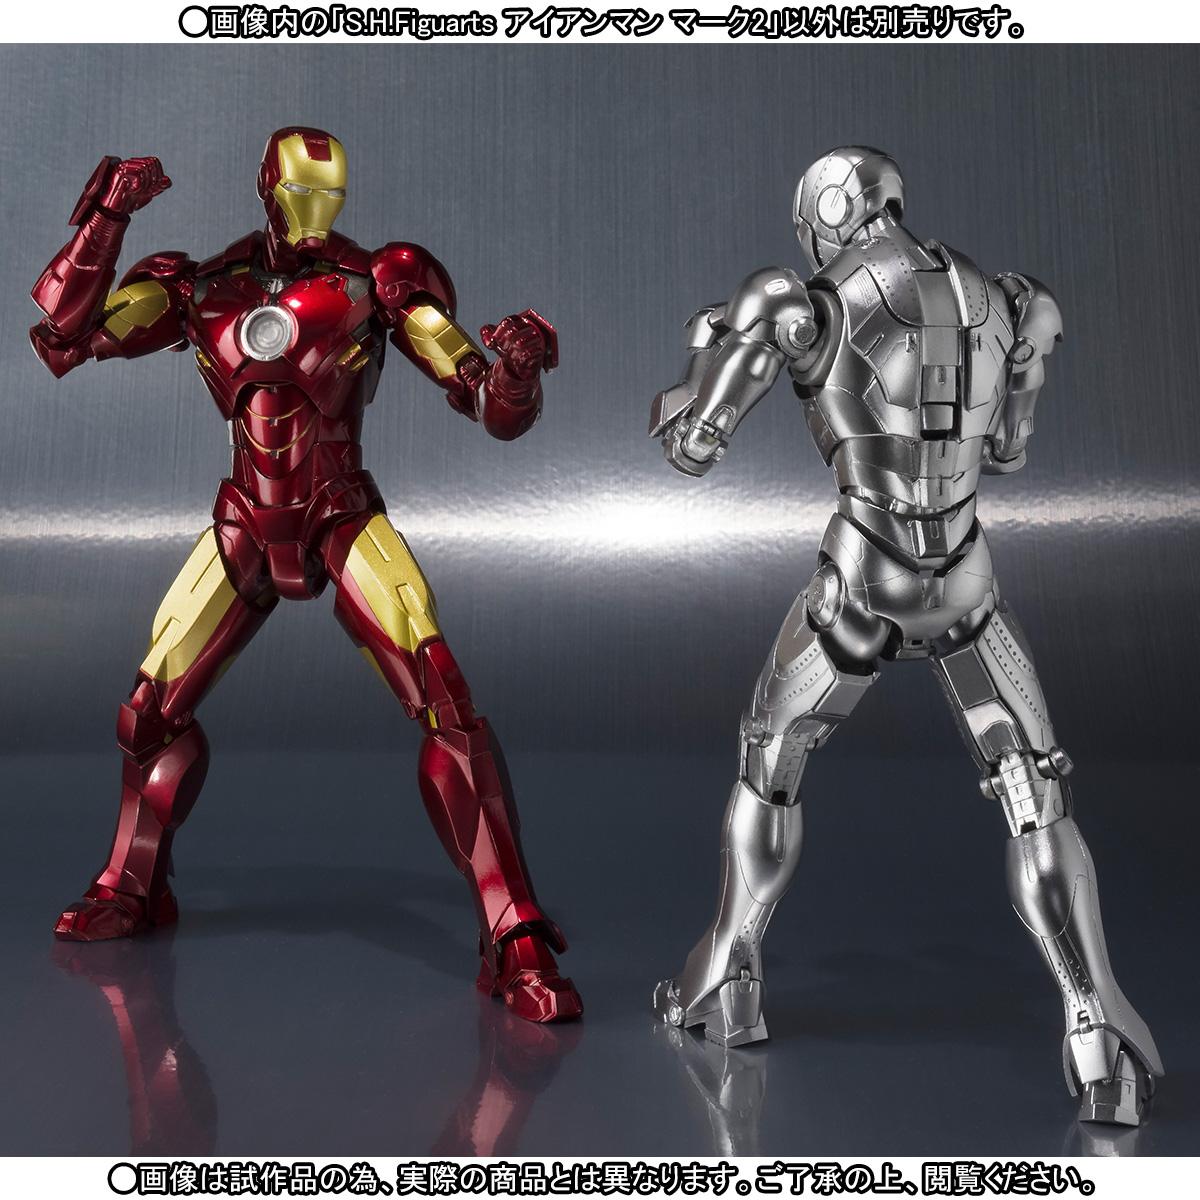 [Comentários] Marvel S.H.Figuarts - Página 2 CvEt7GxQ